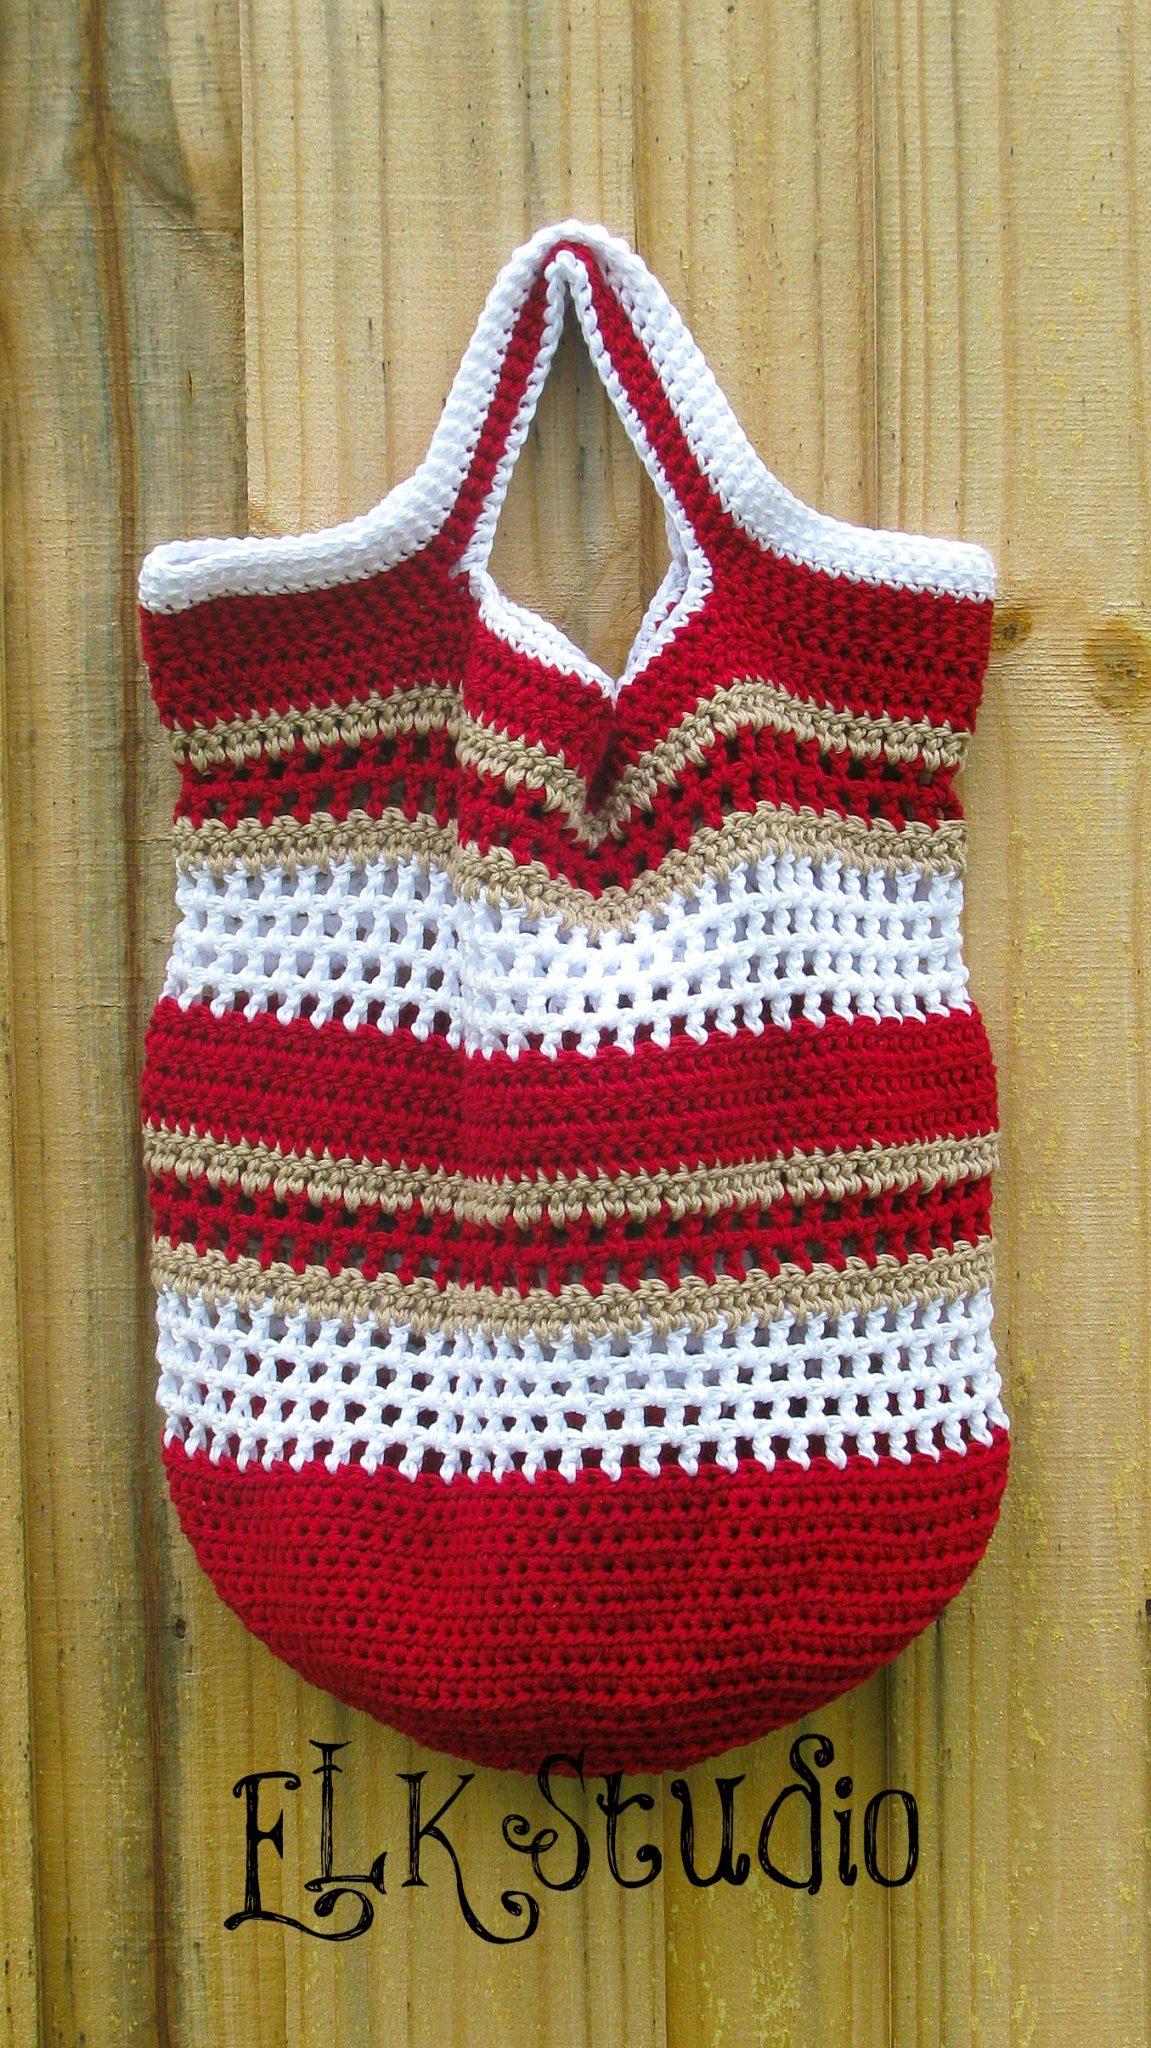 Free Fun in the Sun Crochet Beach Bag! - ELK Studio - Handcrafted ...